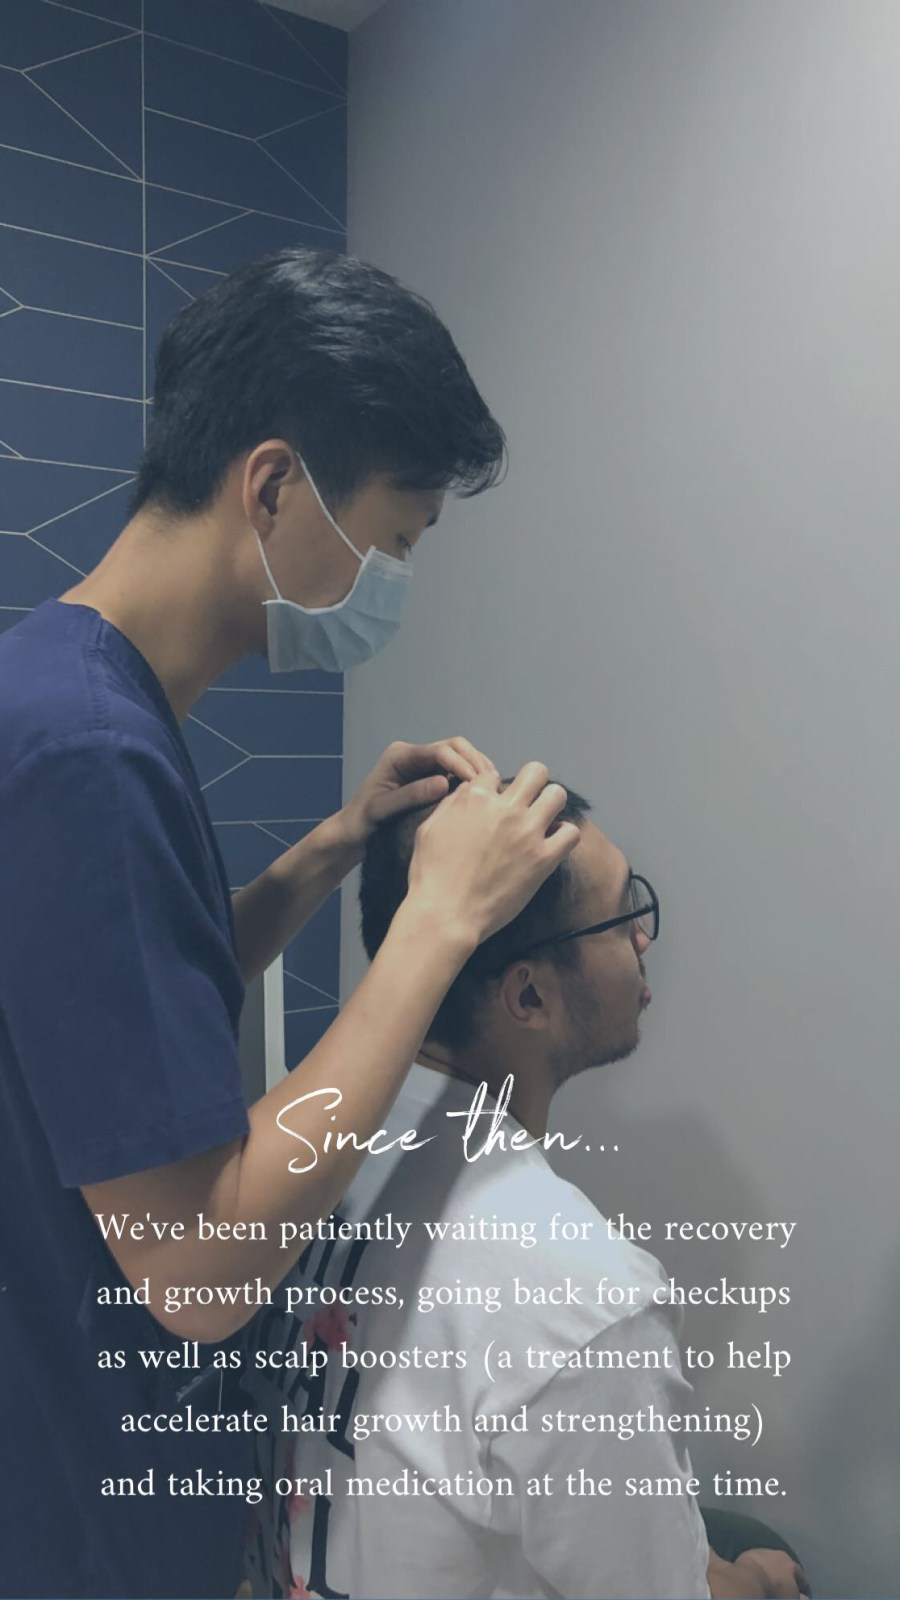 Hair transplant post-surgery followup